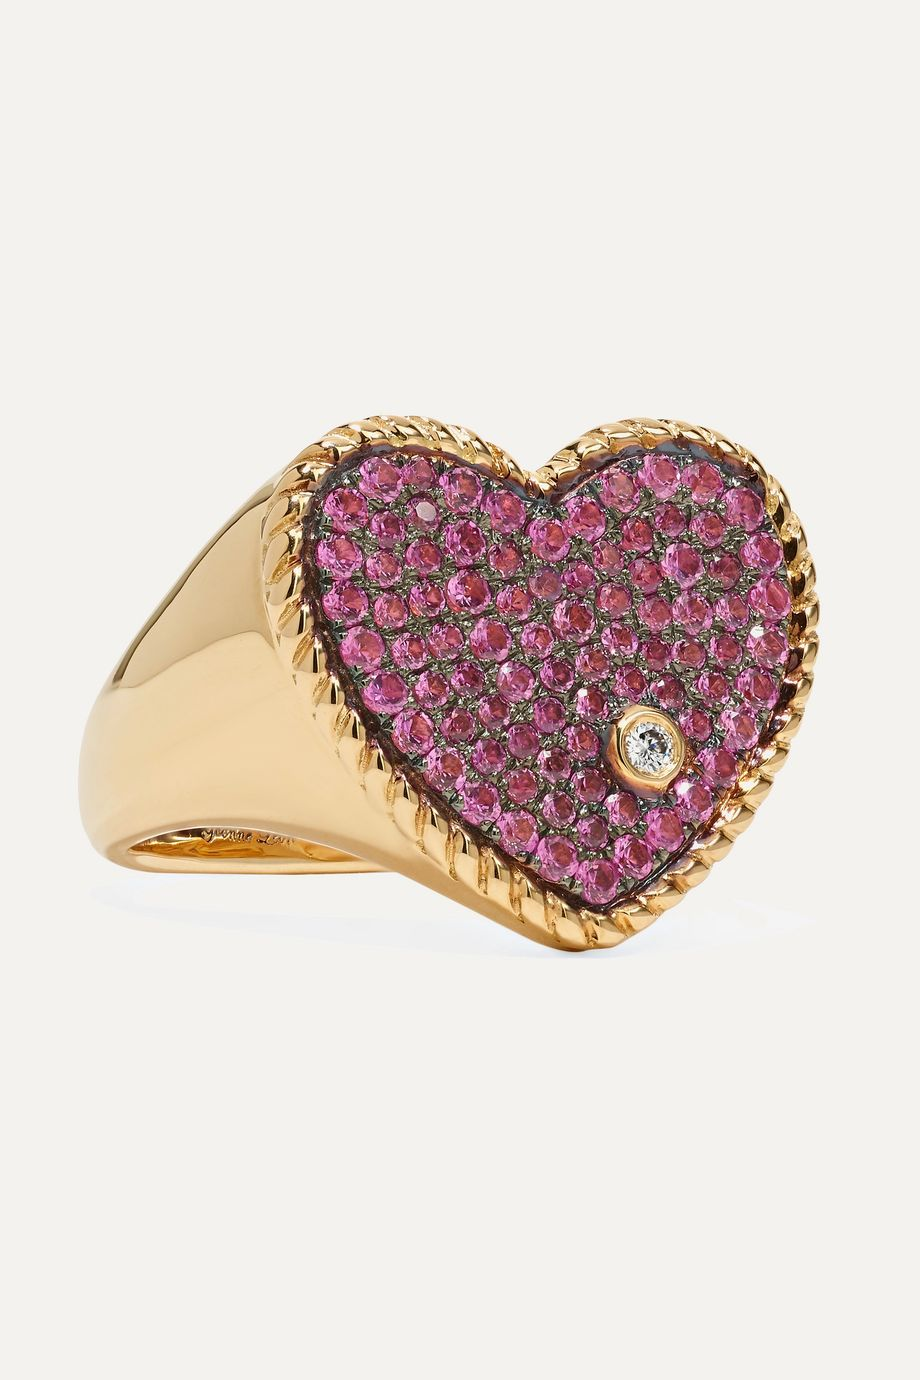 Yvonne Léon 18-karat gold, sapphire and diamond ring